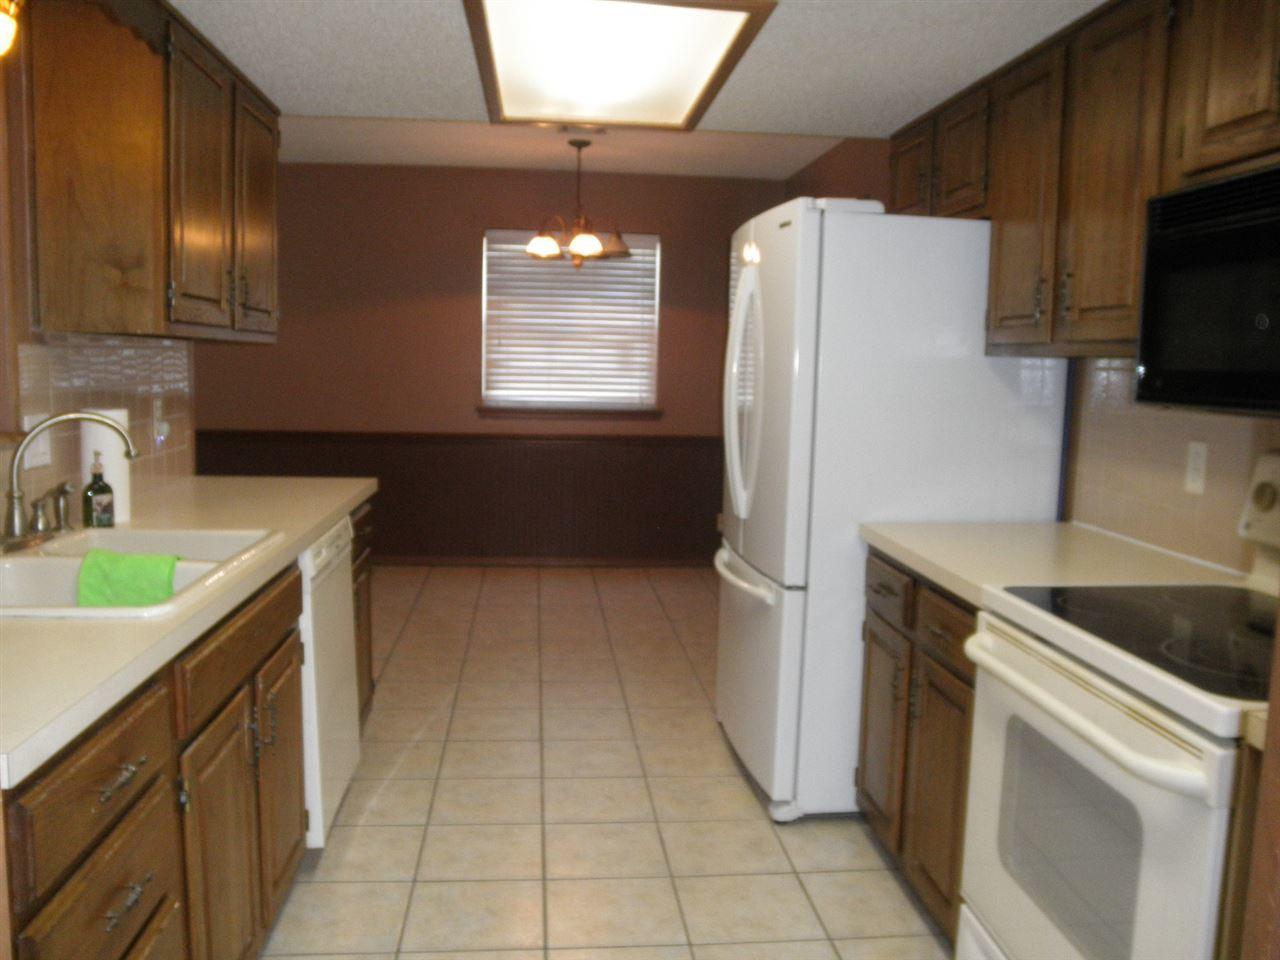 Sold Cross Sale W/ MLS | 300 Lora Ponca City, OK 74601 5